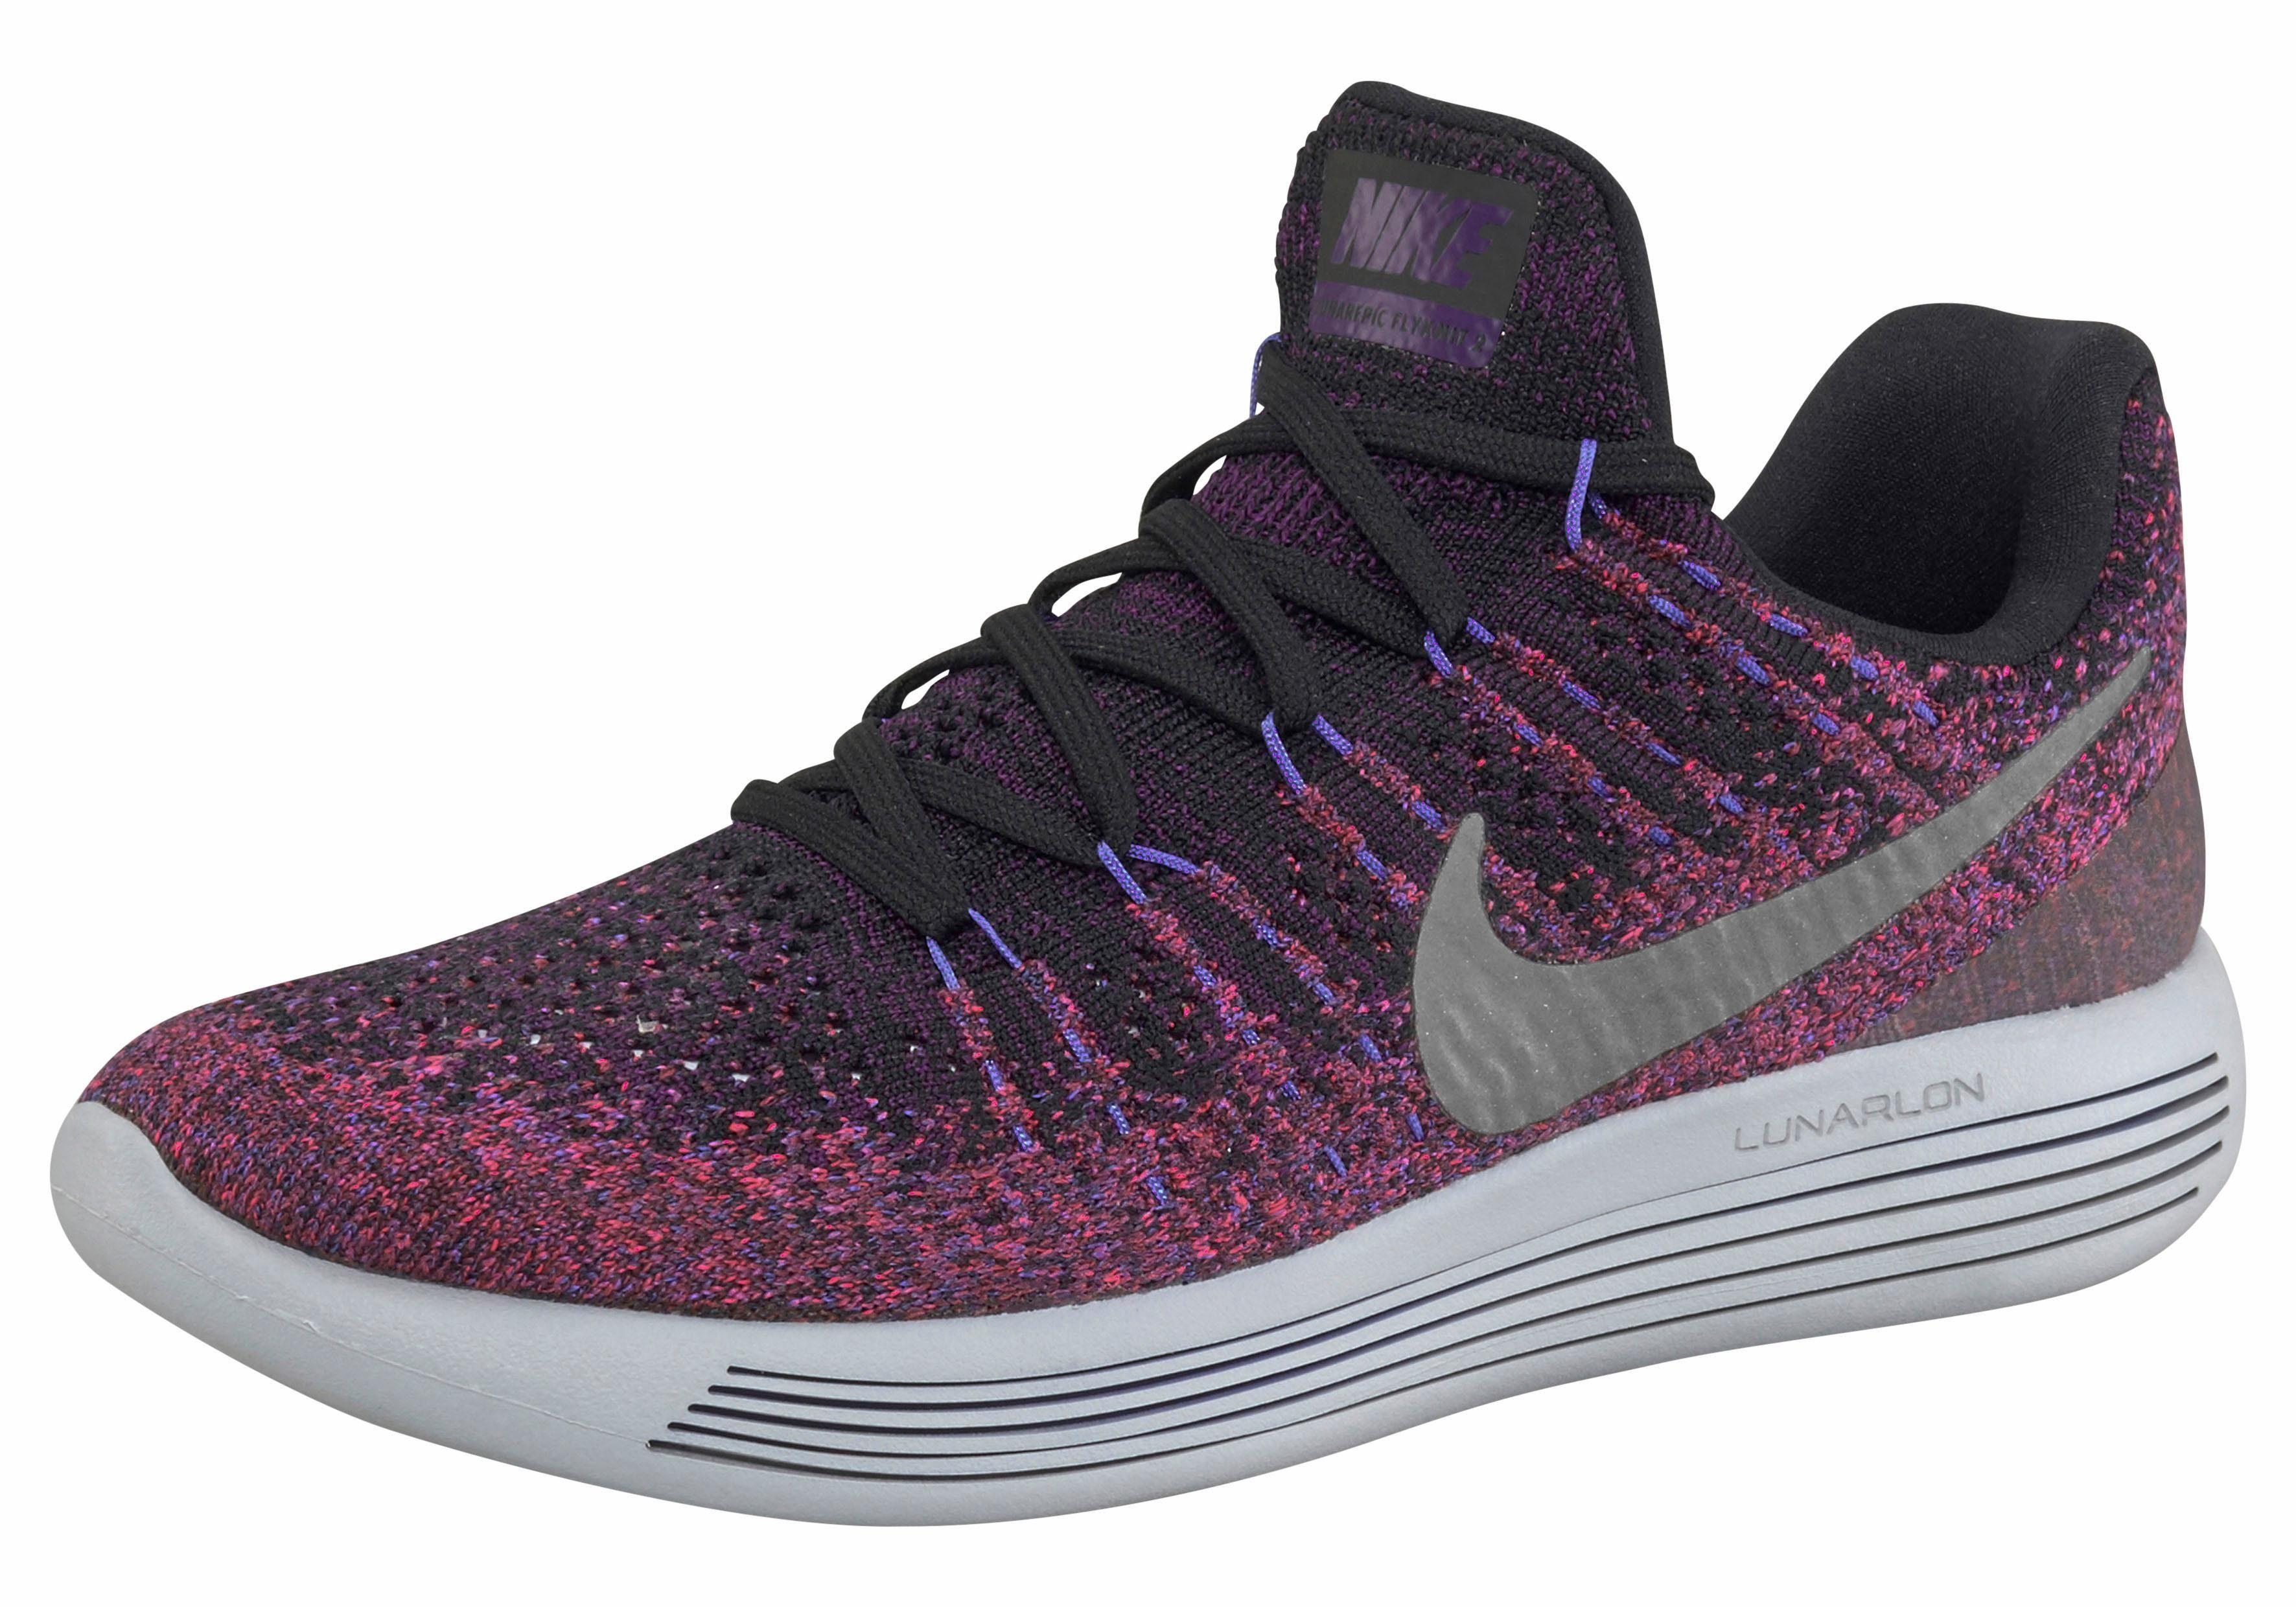 Nike Wmns Lunarepic Low Flyknit 2 Laufschuh  schwarz-pink